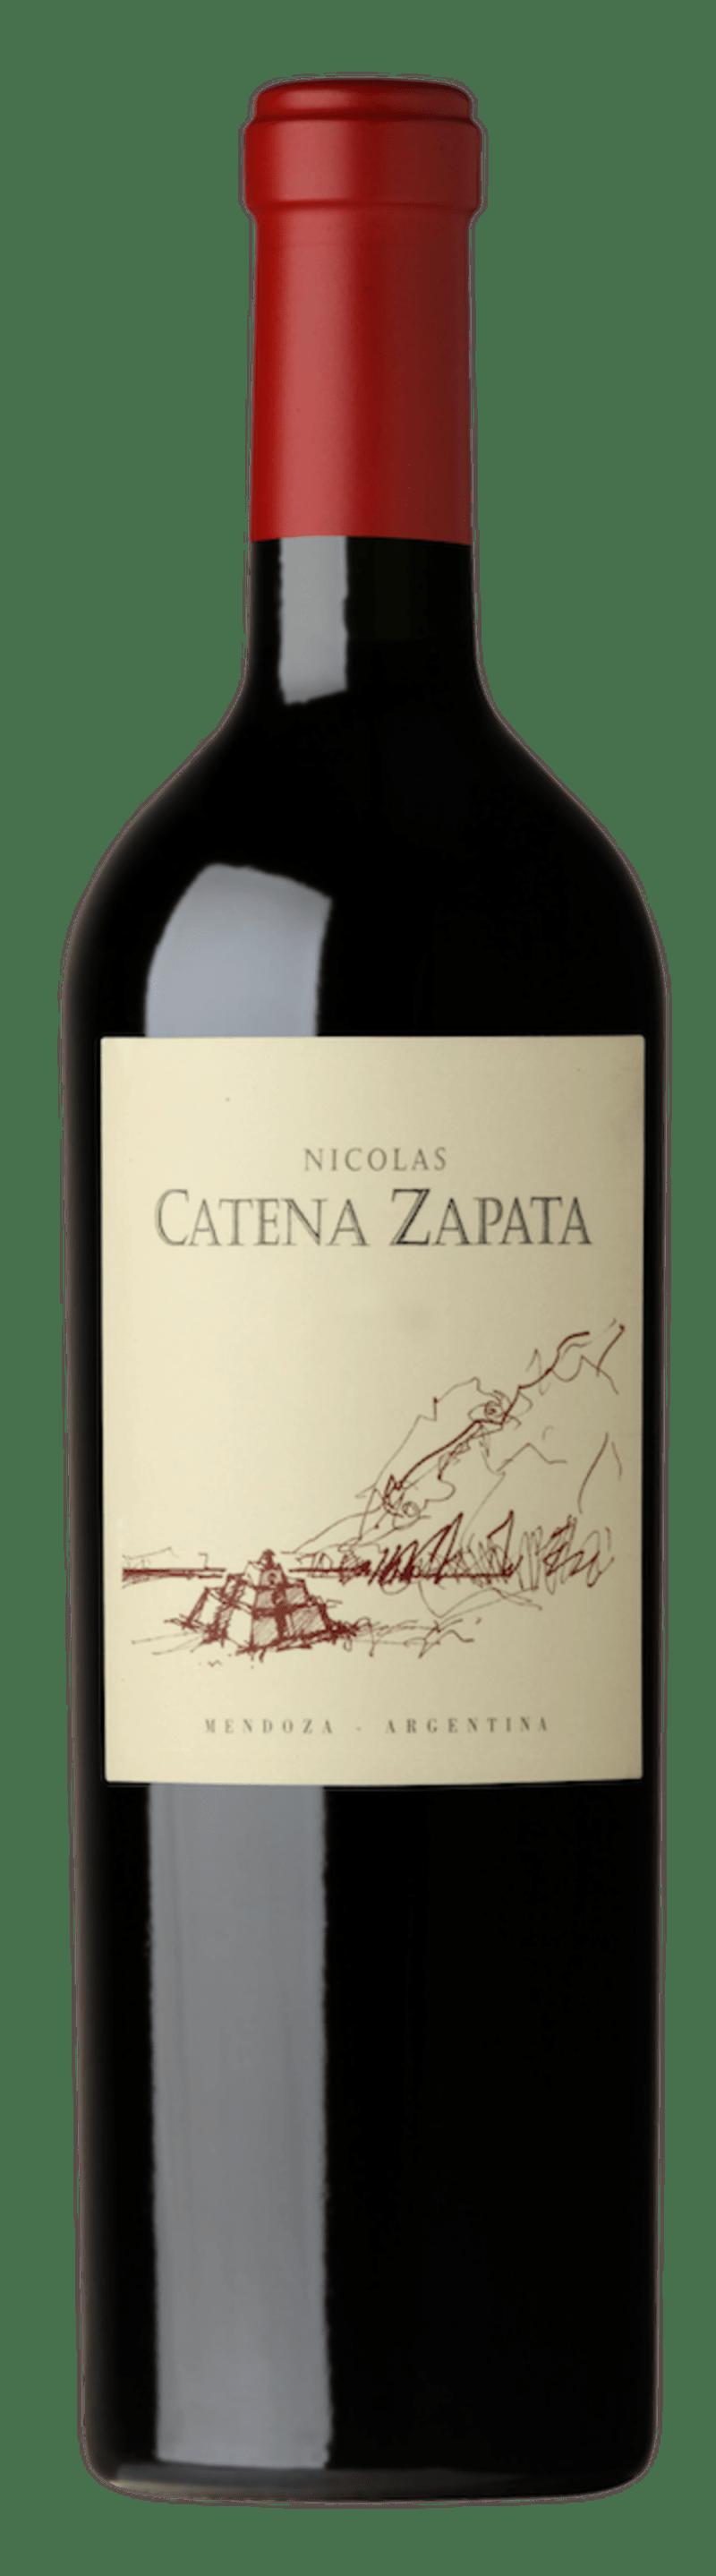 Nicolás Catena Zapata